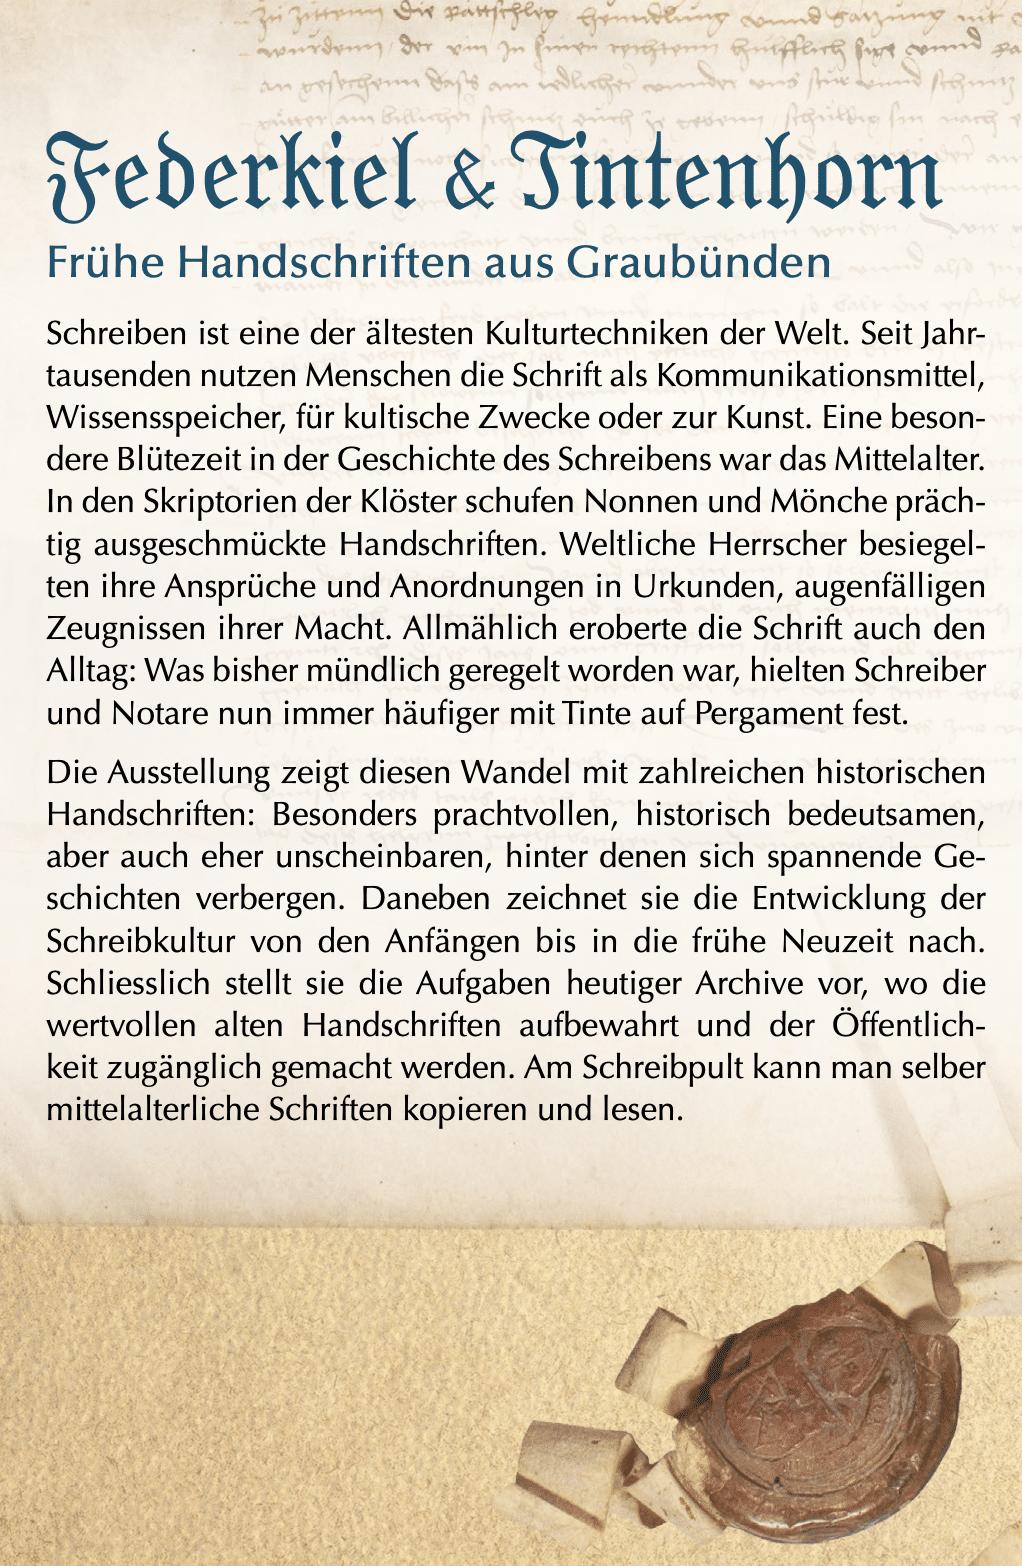 Ausstellung Frühe Handschriften in Graubünden